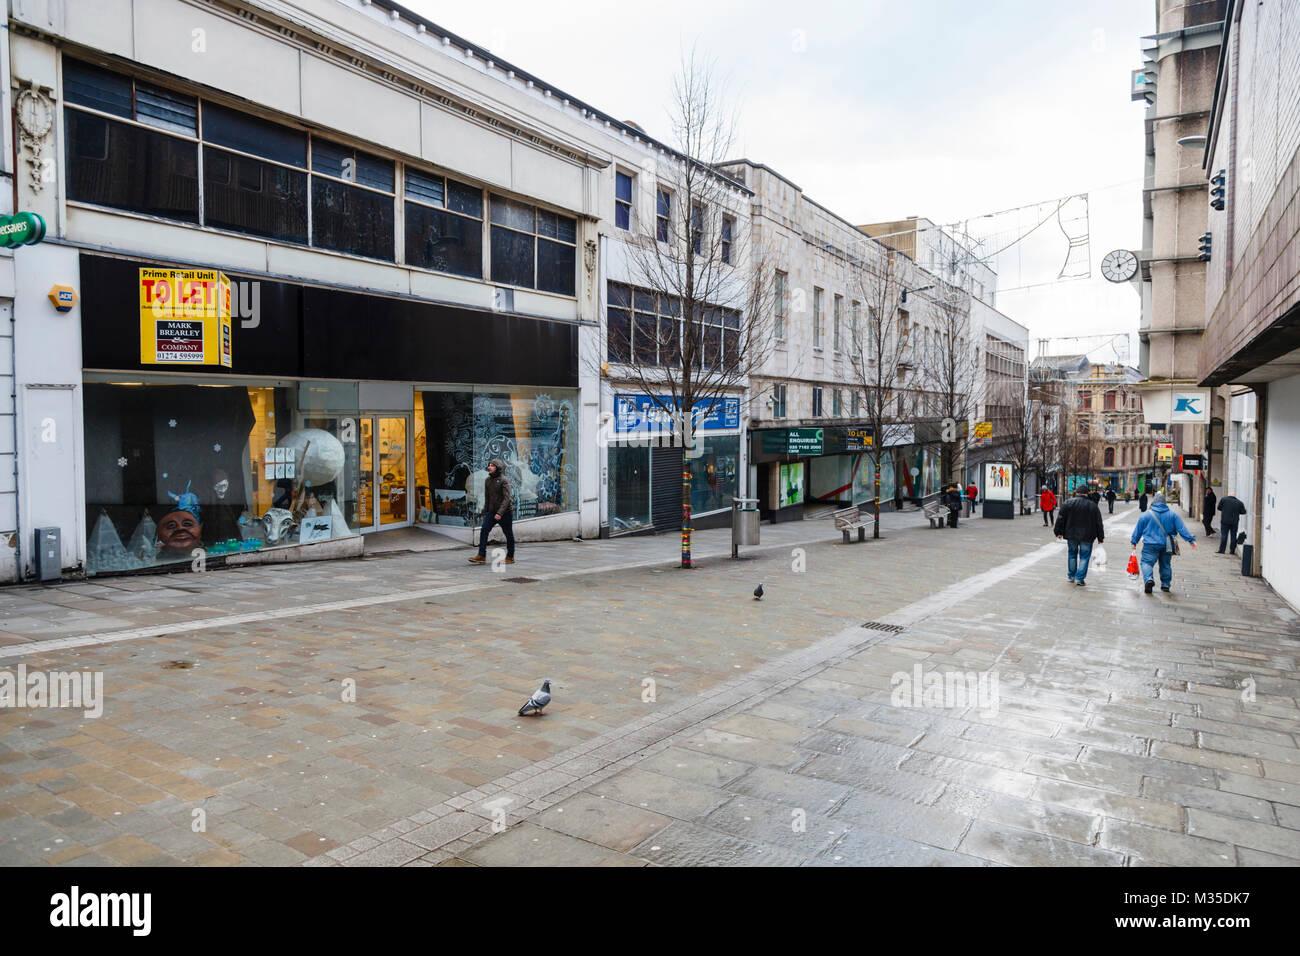 Darley Street, Bradford, West Yorkshire - Stock Image